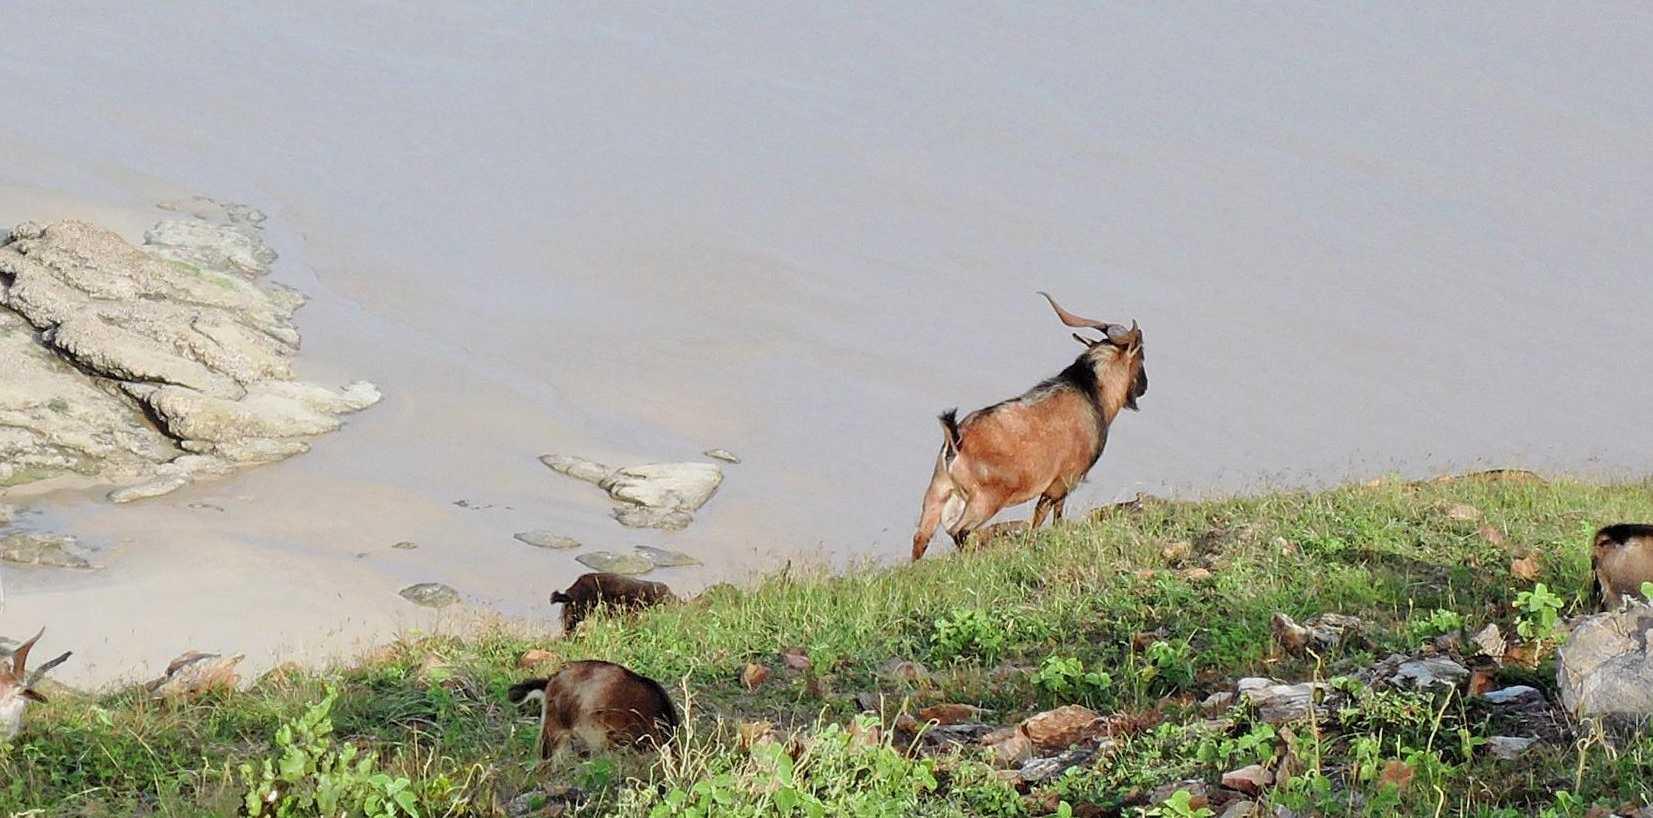 NICE VIEW: Feral goats graze along barren ridgeline on  Great Keppel Island. Inset: Gerry Christie, of Island Pizza.